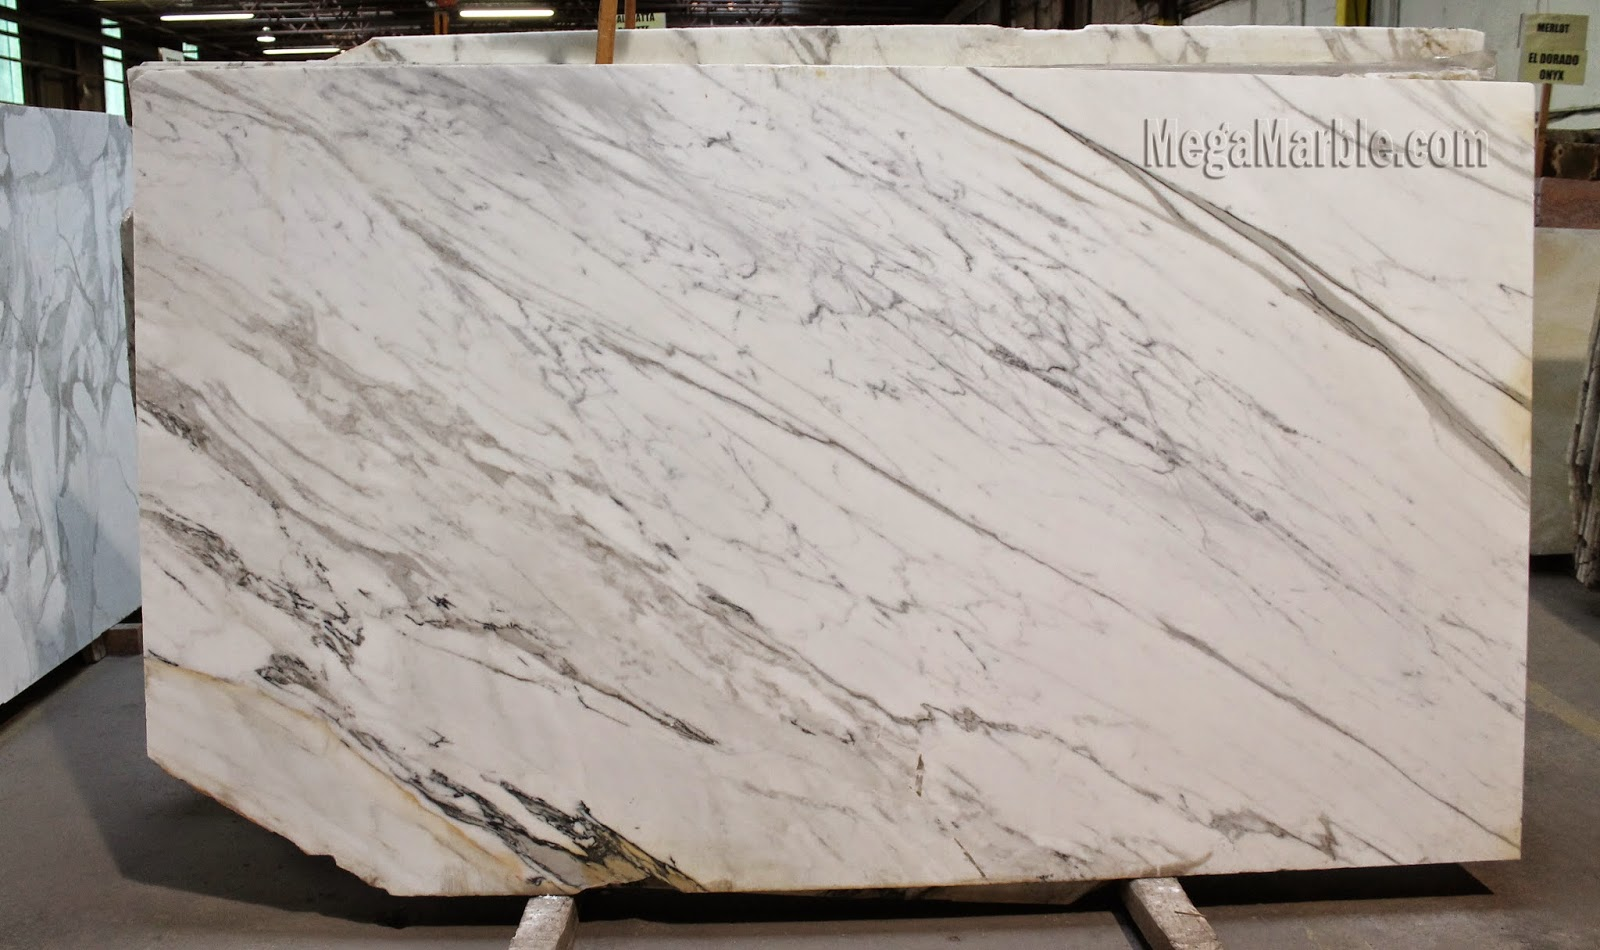 Calacatta White Marble Slabs in New York